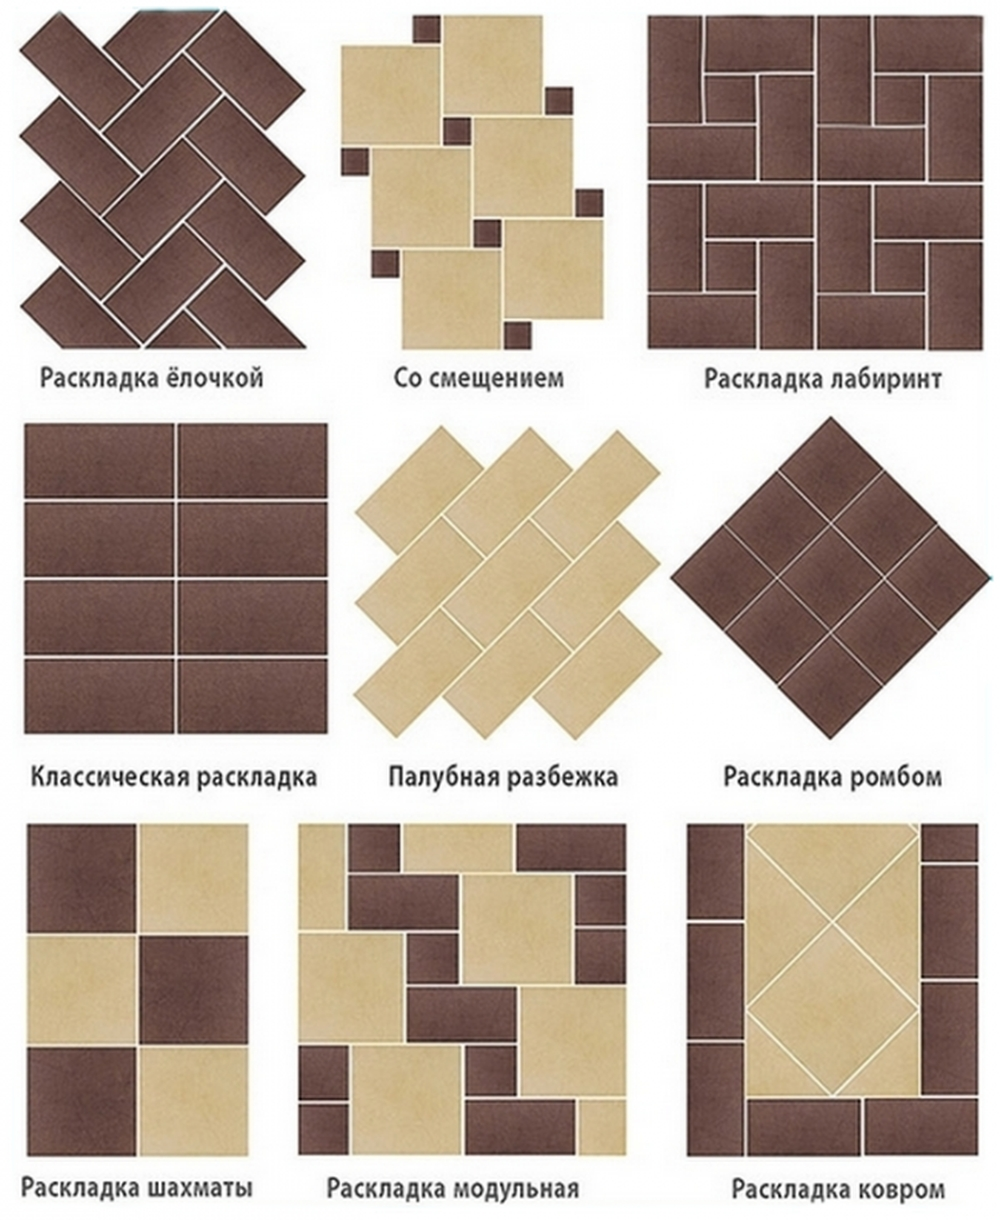 Раскладка плитки схема укладки